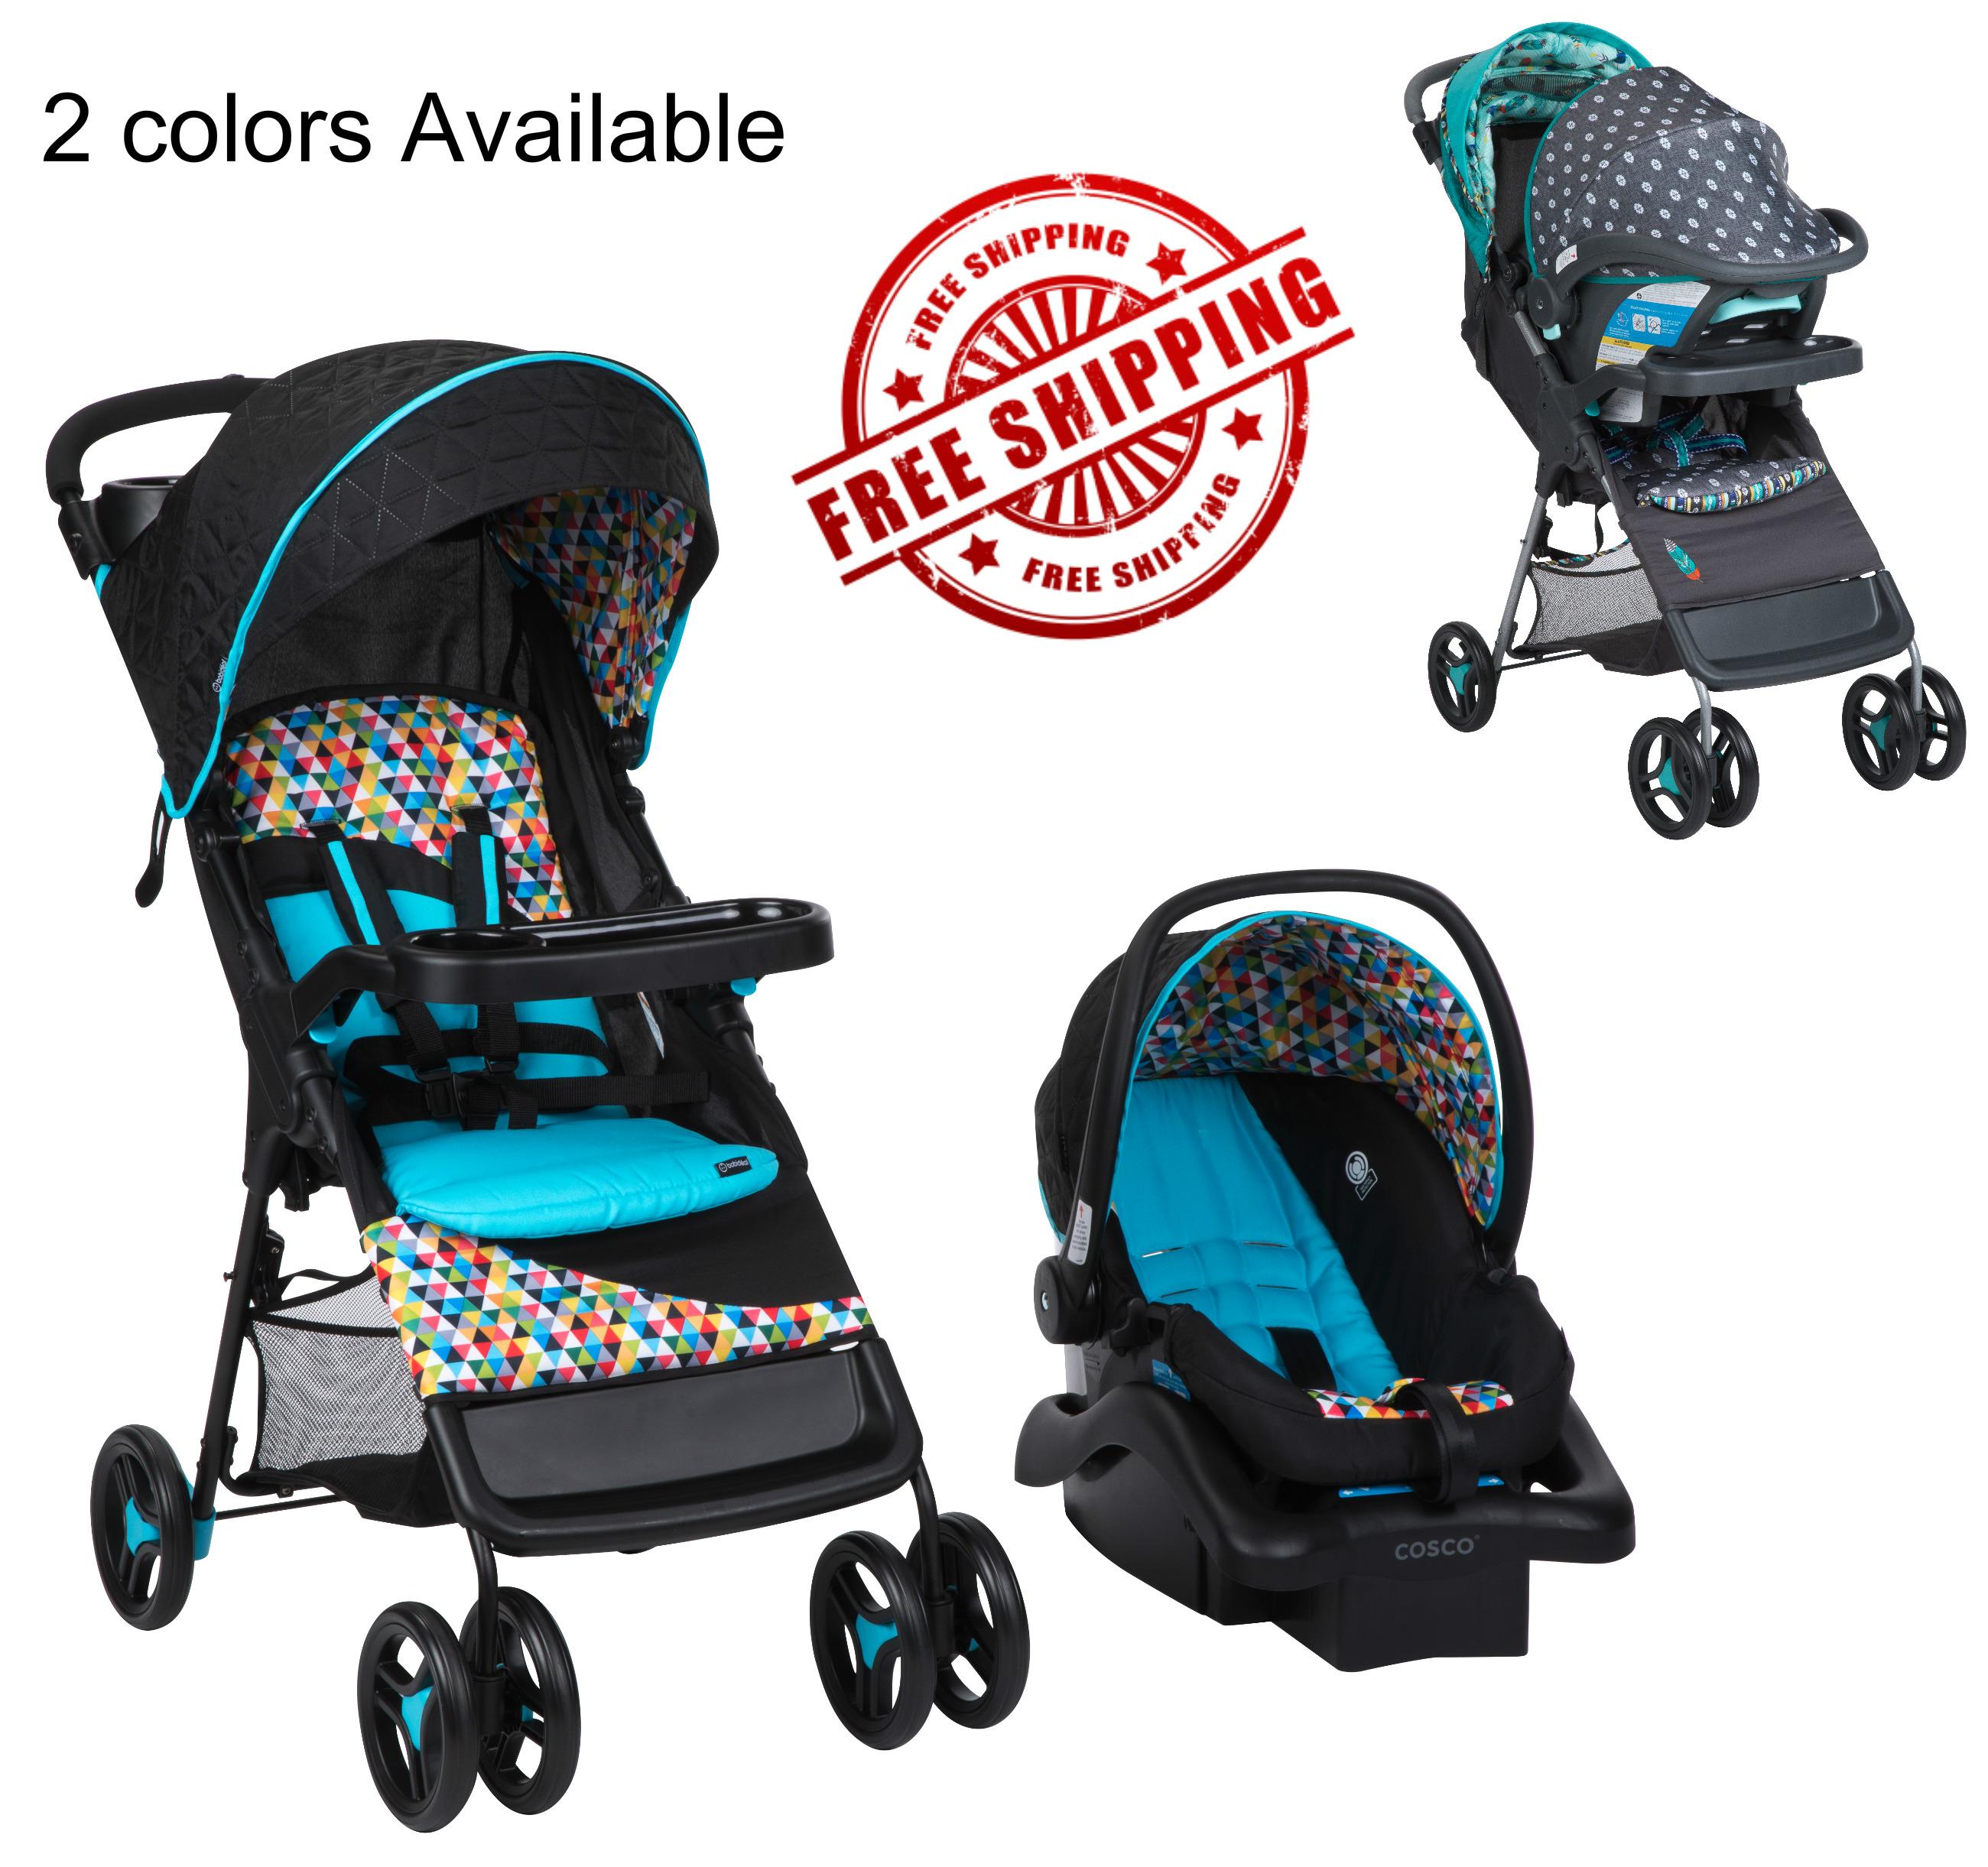 Baby Infant Car Seat Stroller Combo Boys Girl Travel System